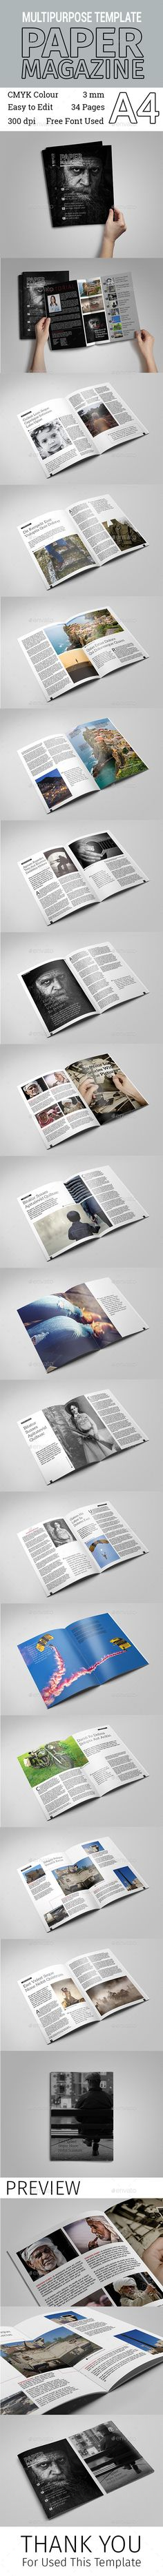 Multipurpose Paper Magazine Template InDesign INDD #design Download: http://graphicriver.net/item/multipurpose-paper-magazine-template/14120148?ref=ksioks